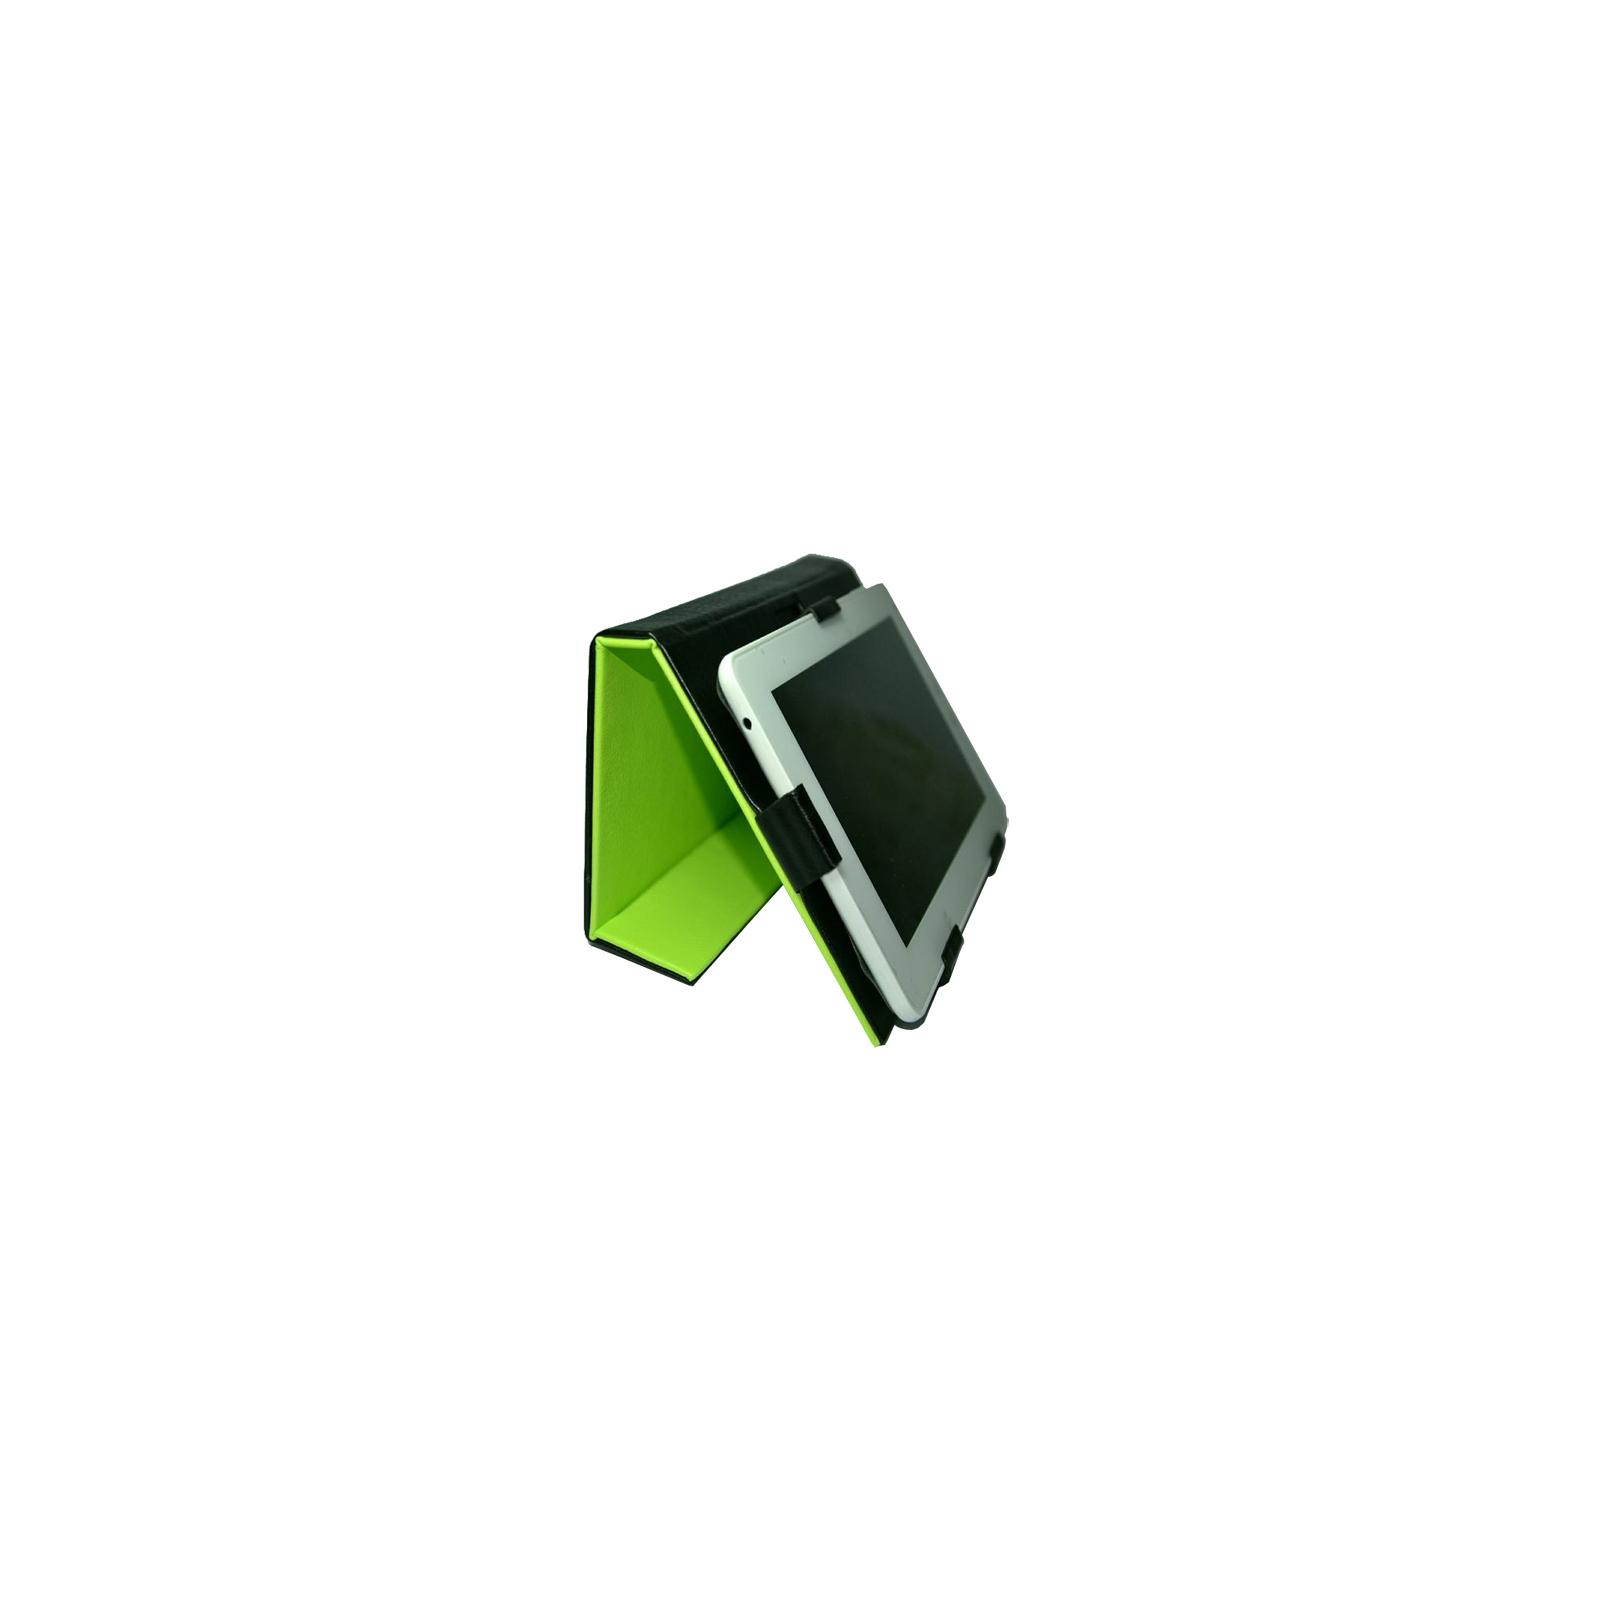 Чехол для планшета Vento 10.1 Desire Bright - lime изображение 3